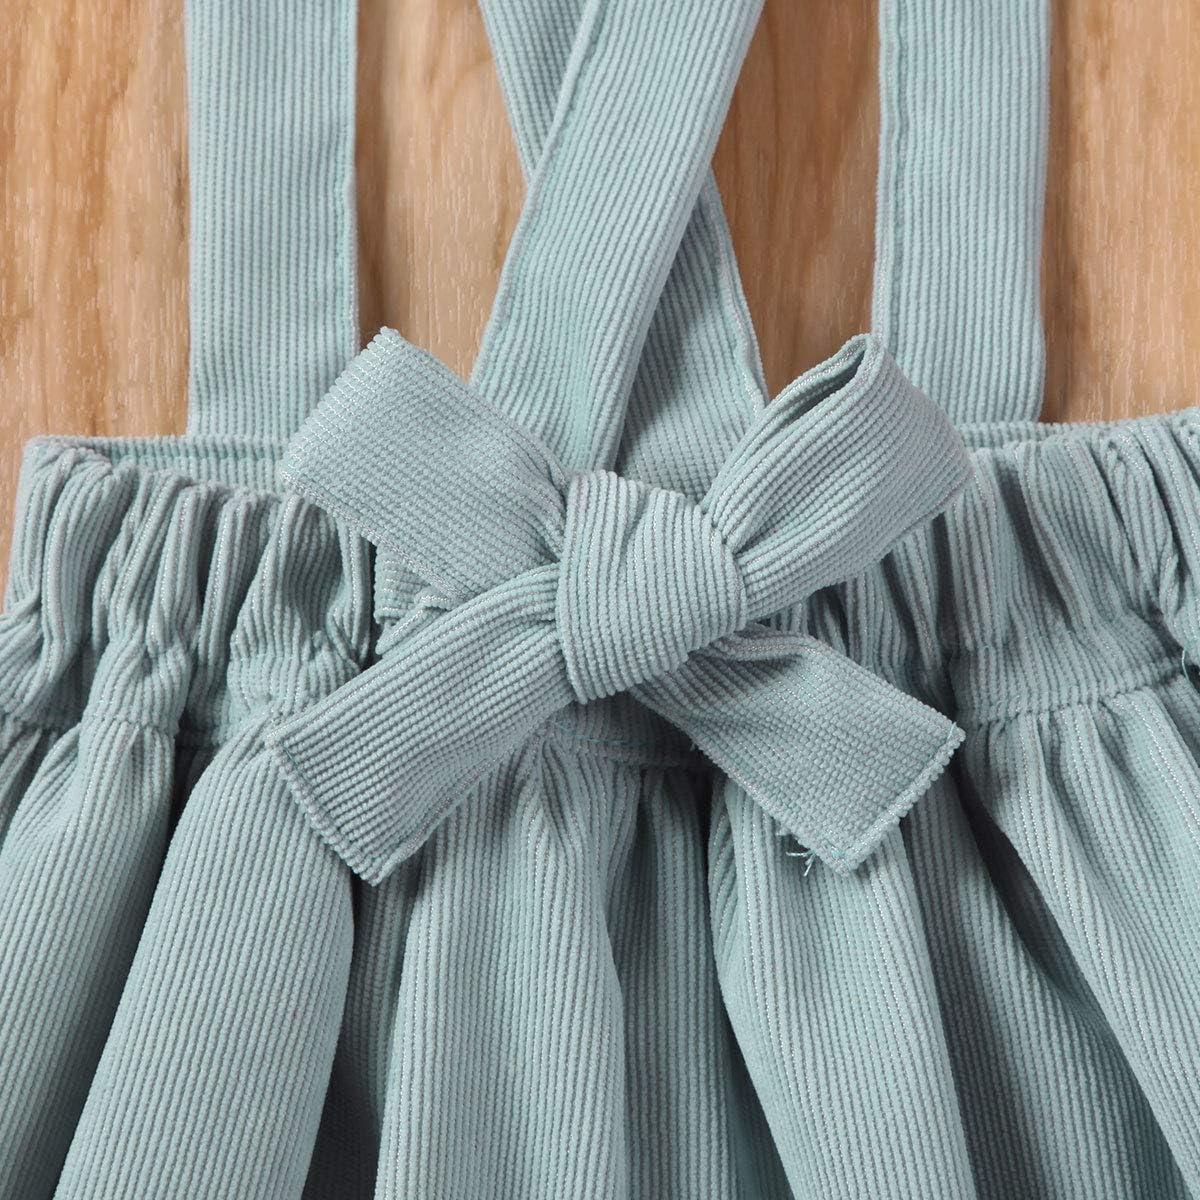 Specialcal Baby Girls Velvet Suspender Skirt Infant Toddler Ruffled Casual Strap Sundress Summer Outfit Clothes